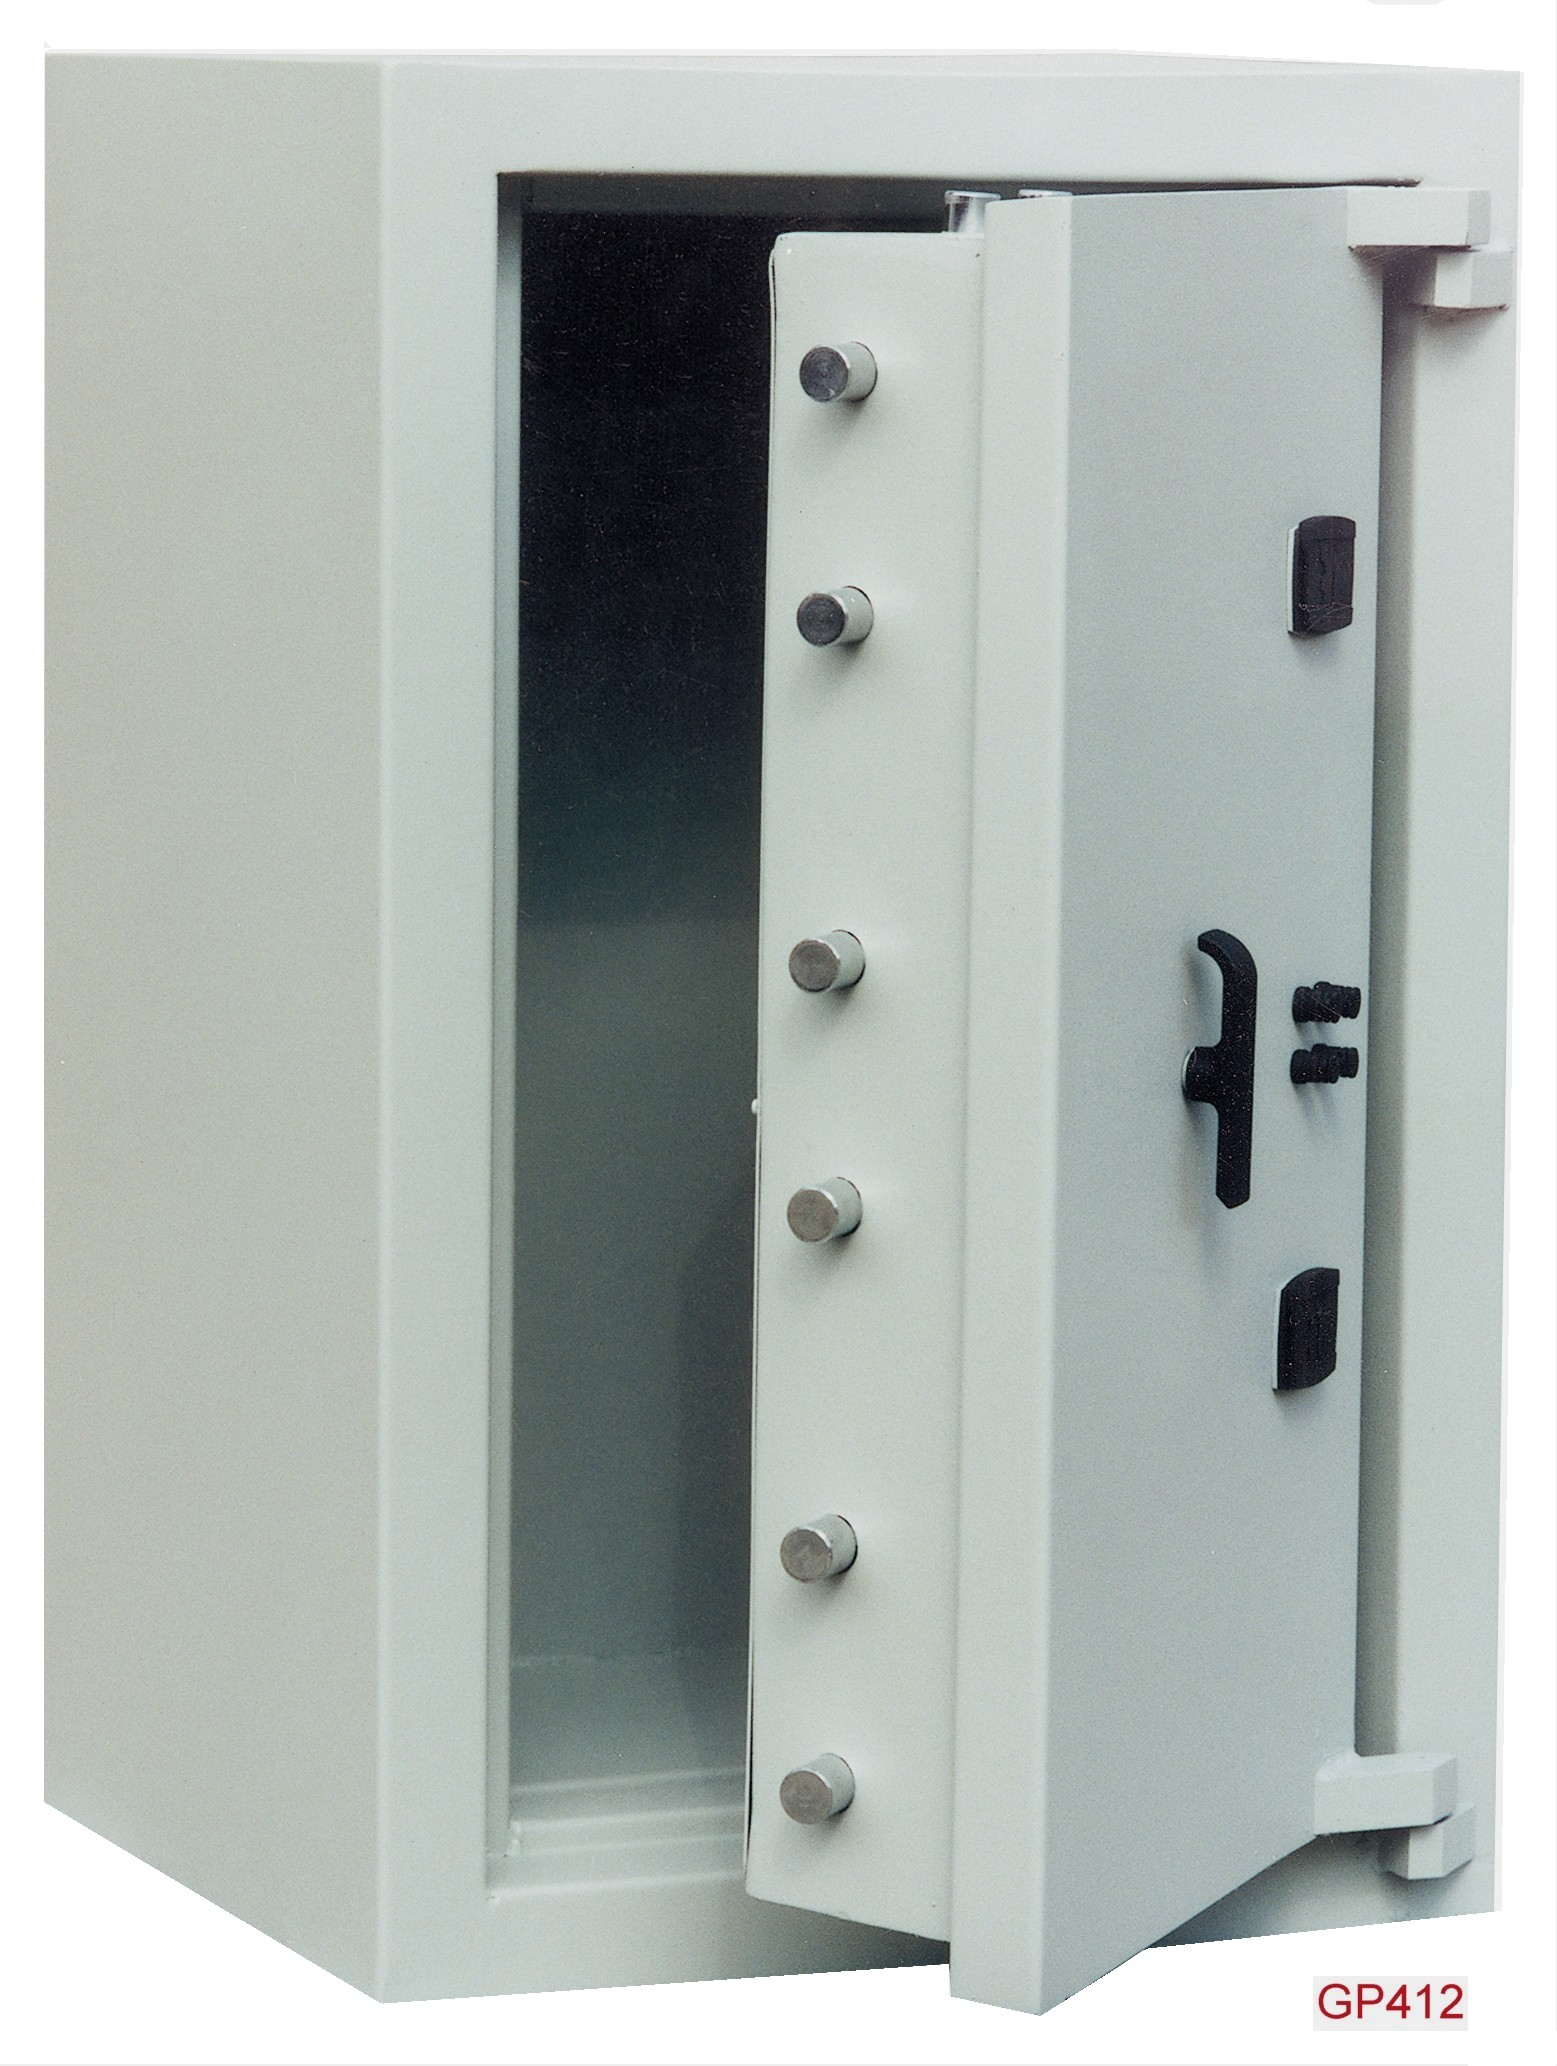 coffres forts securite incendie dacosta. Black Bedroom Furniture Sets. Home Design Ideas